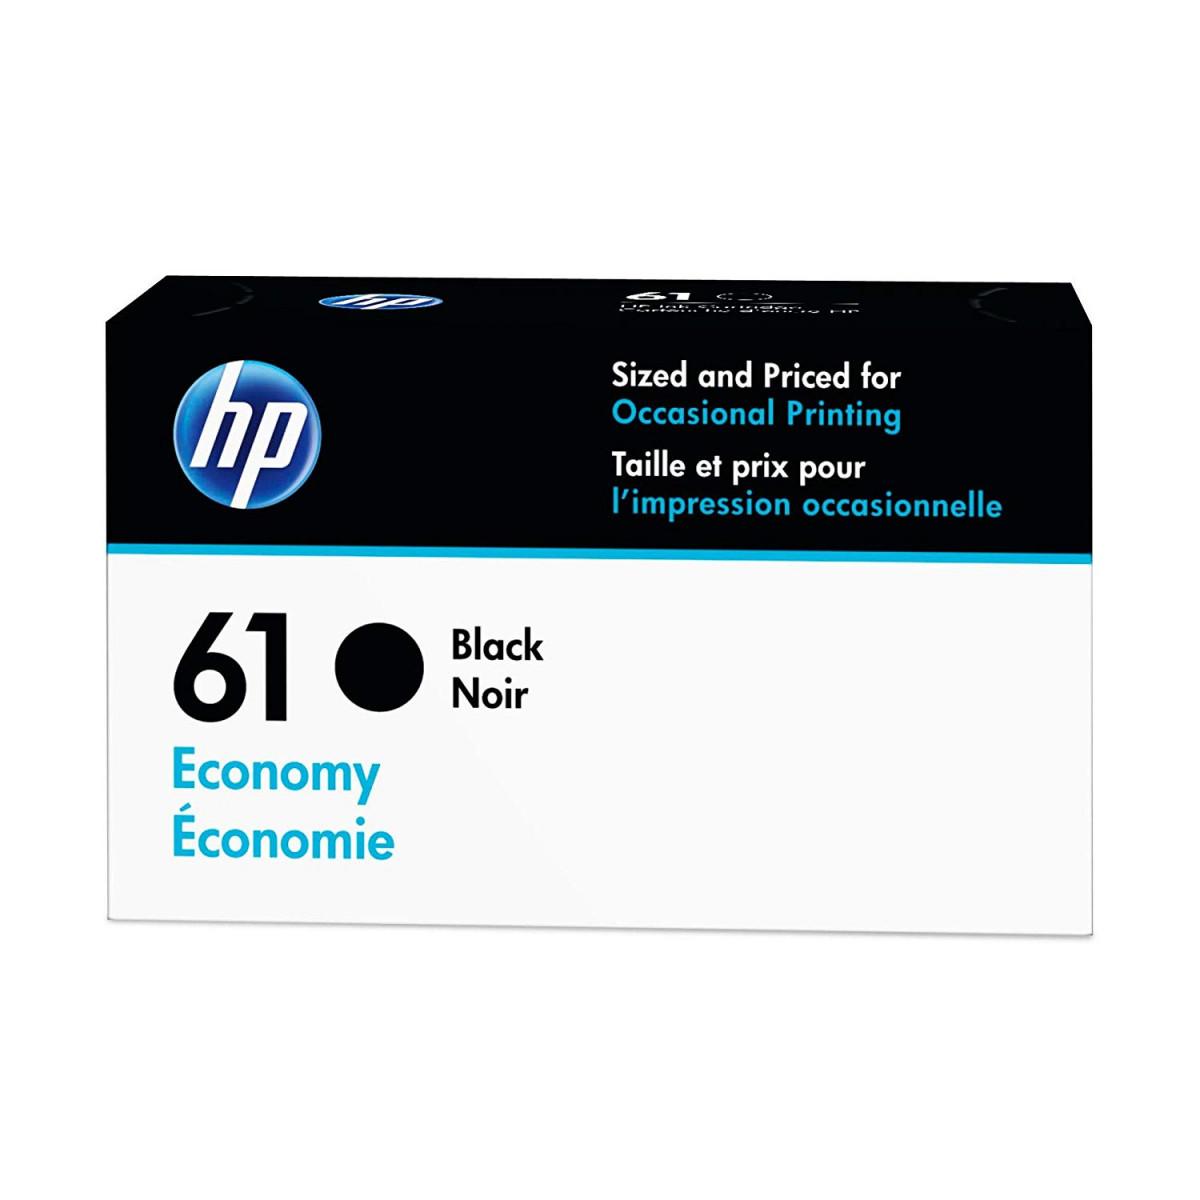 1000 1010 hp 61 ink cartridge black economy (b3b07an) for hp deskjet 1000 1010 1012  1050 1051 1055 1056 1510 1512 1514 1051 2050 2510 2512 2514 2540 2541 2542